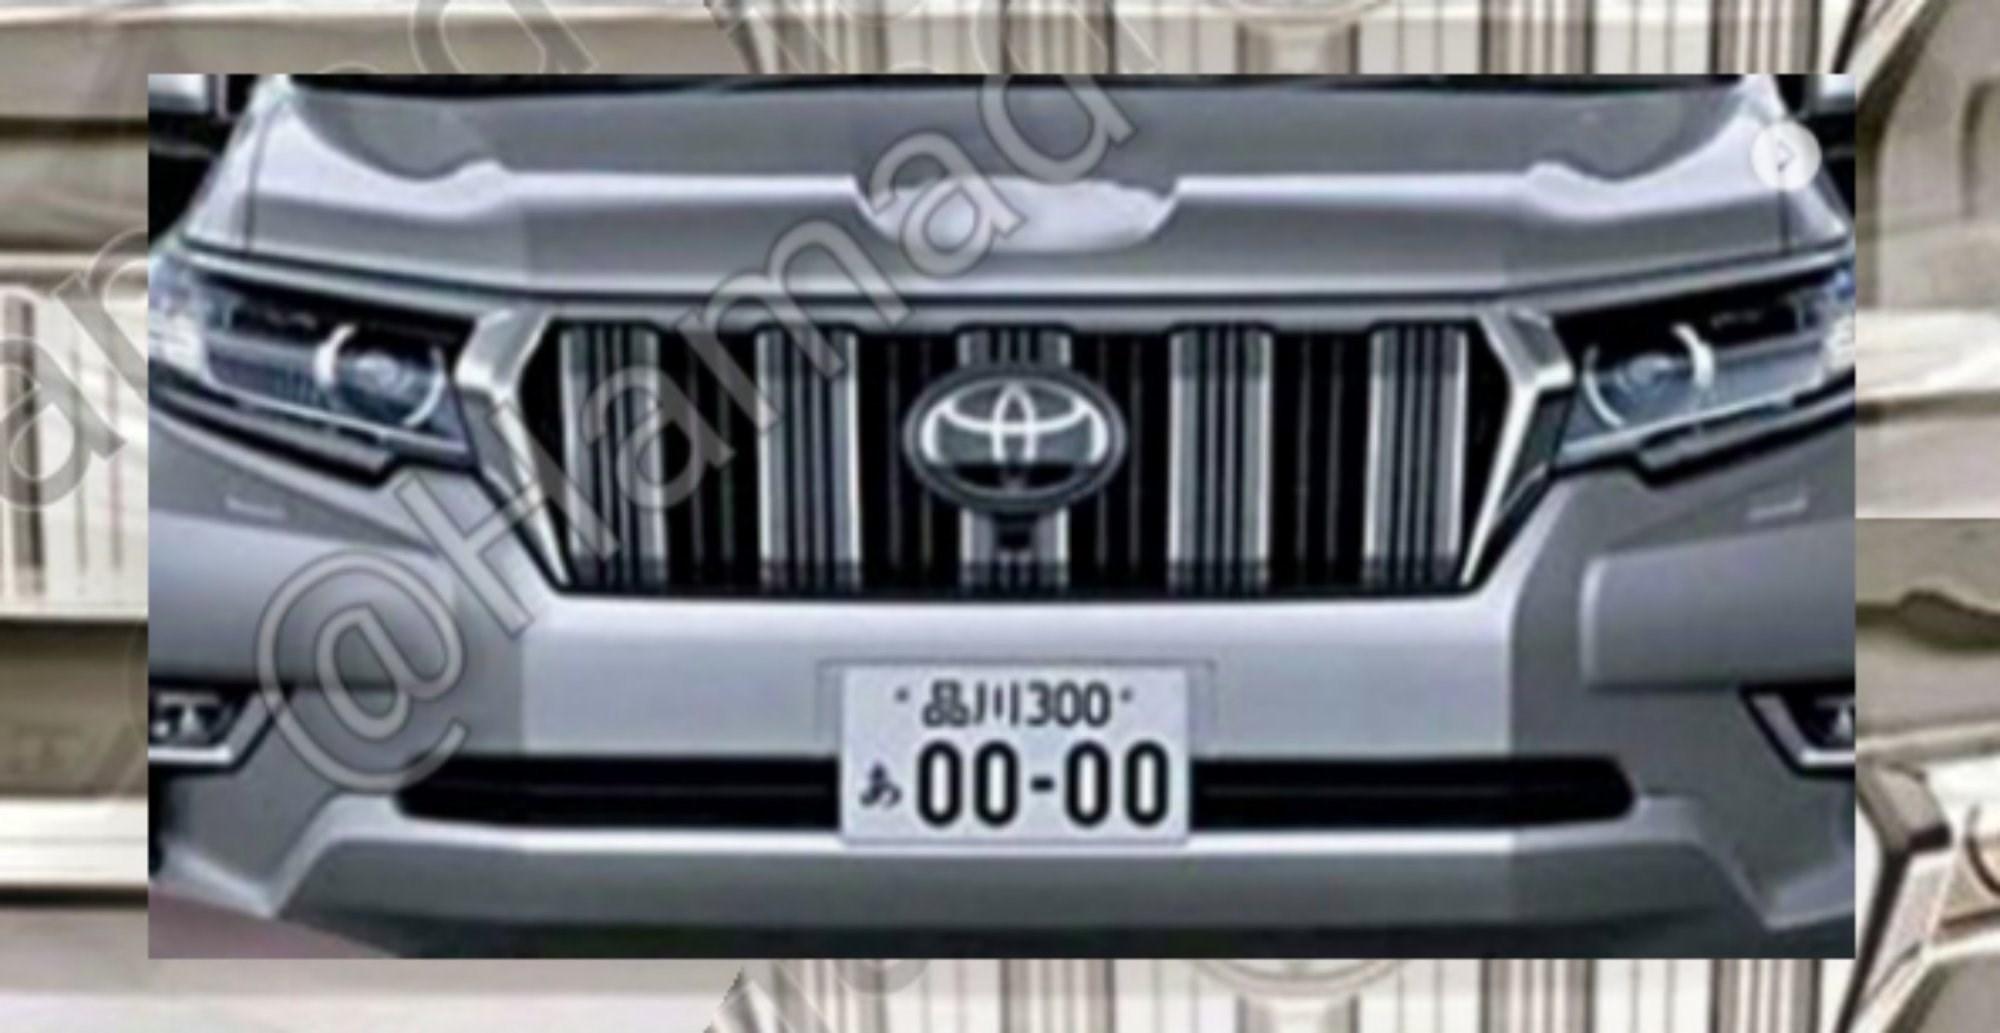 2018 toyota landcruiser sahara. 2018 Toyota Prado Outedu2026 On Instagram Landcruiser Sahara R